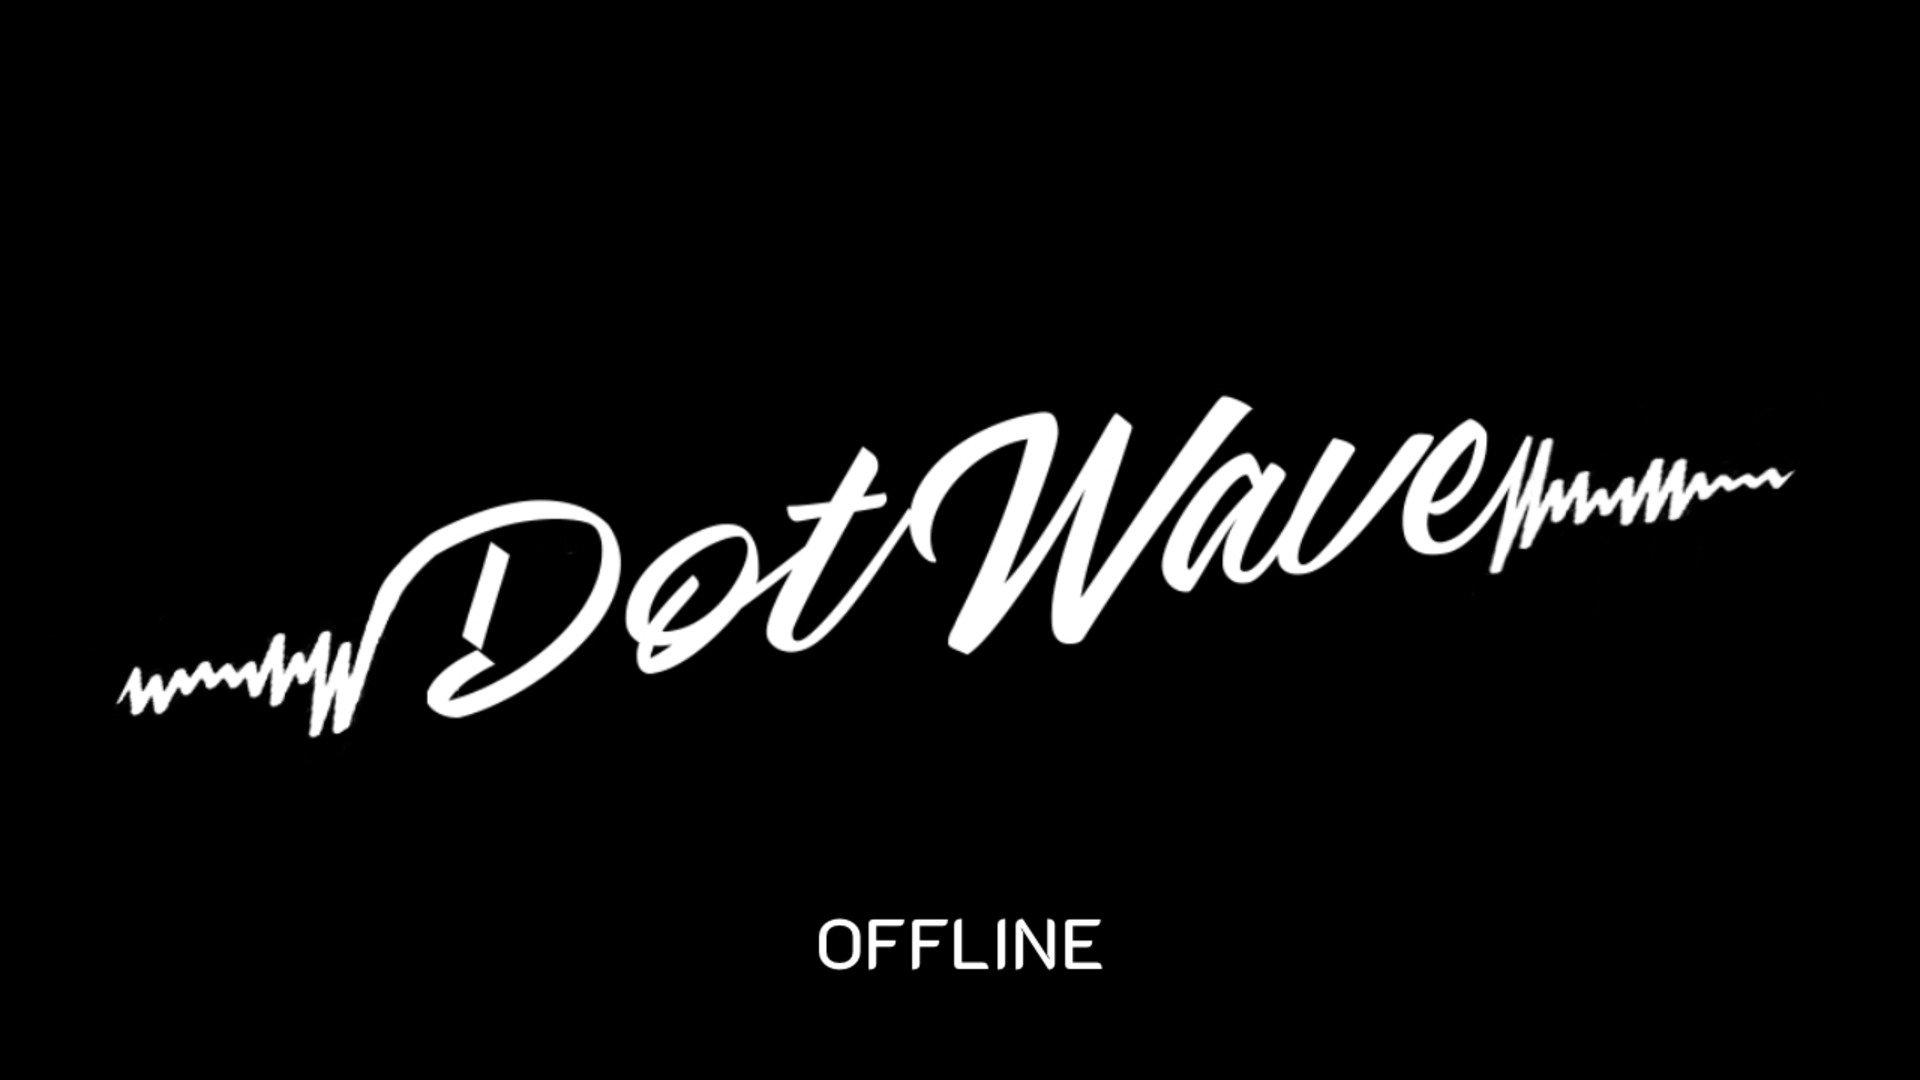 Twitch stream of DotWaveLive